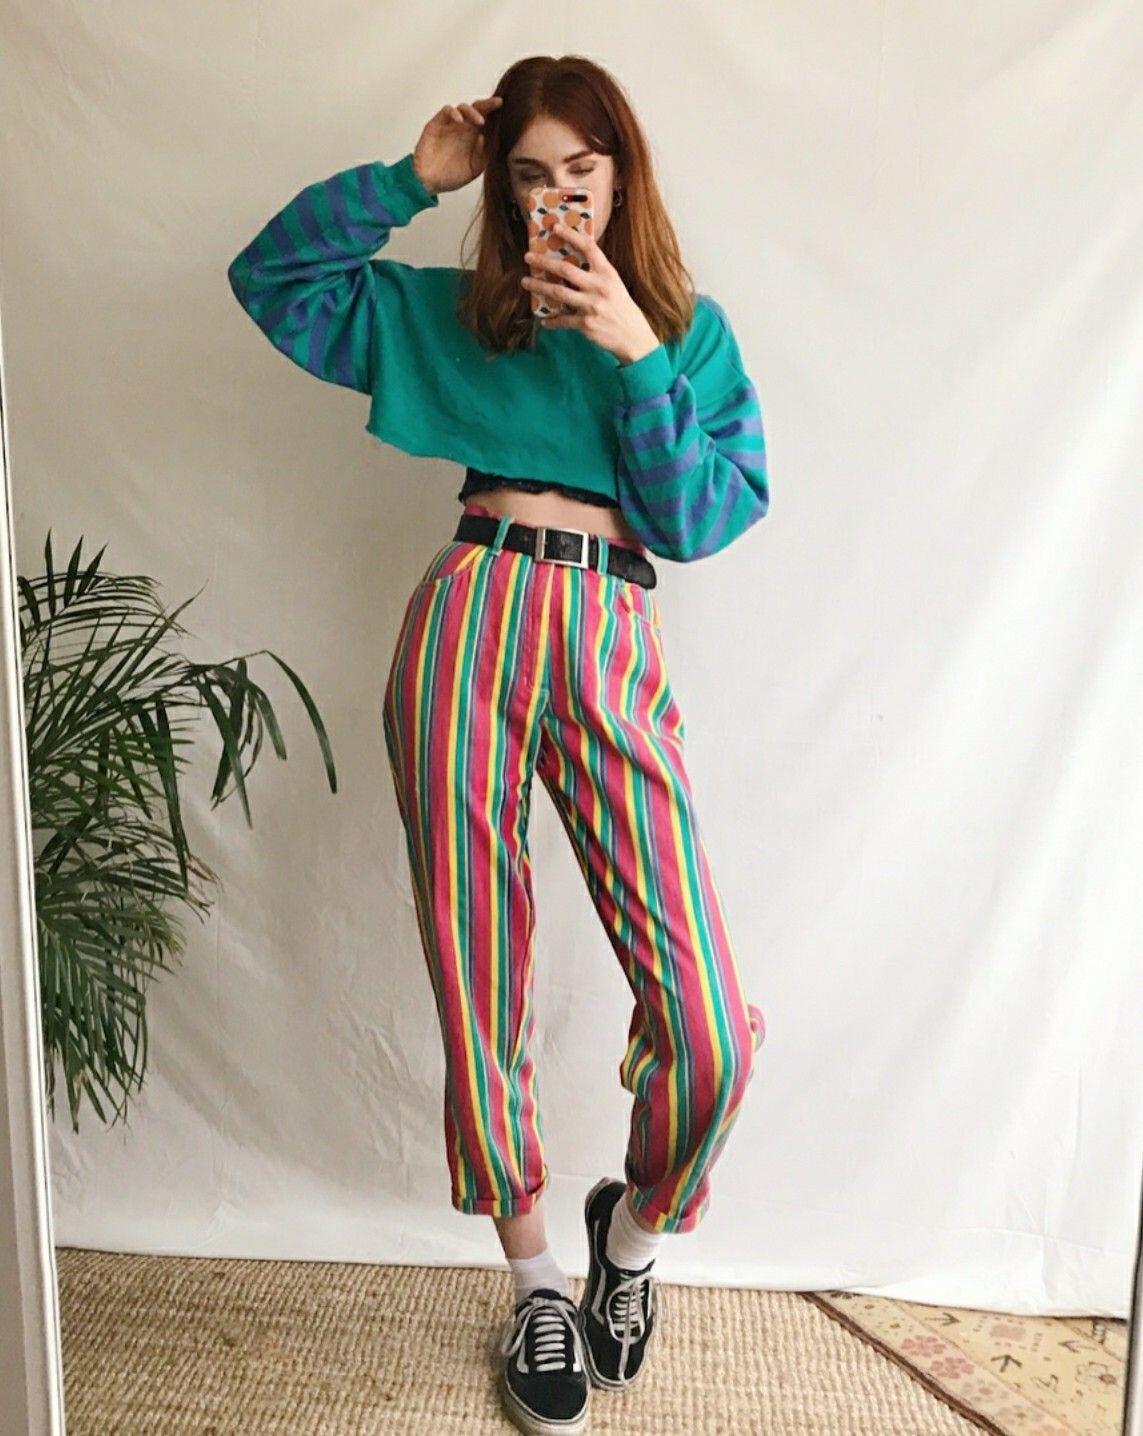 10 Ide Padu Padan Colorful Outfit untuk Gaya Casual nan Atraktif